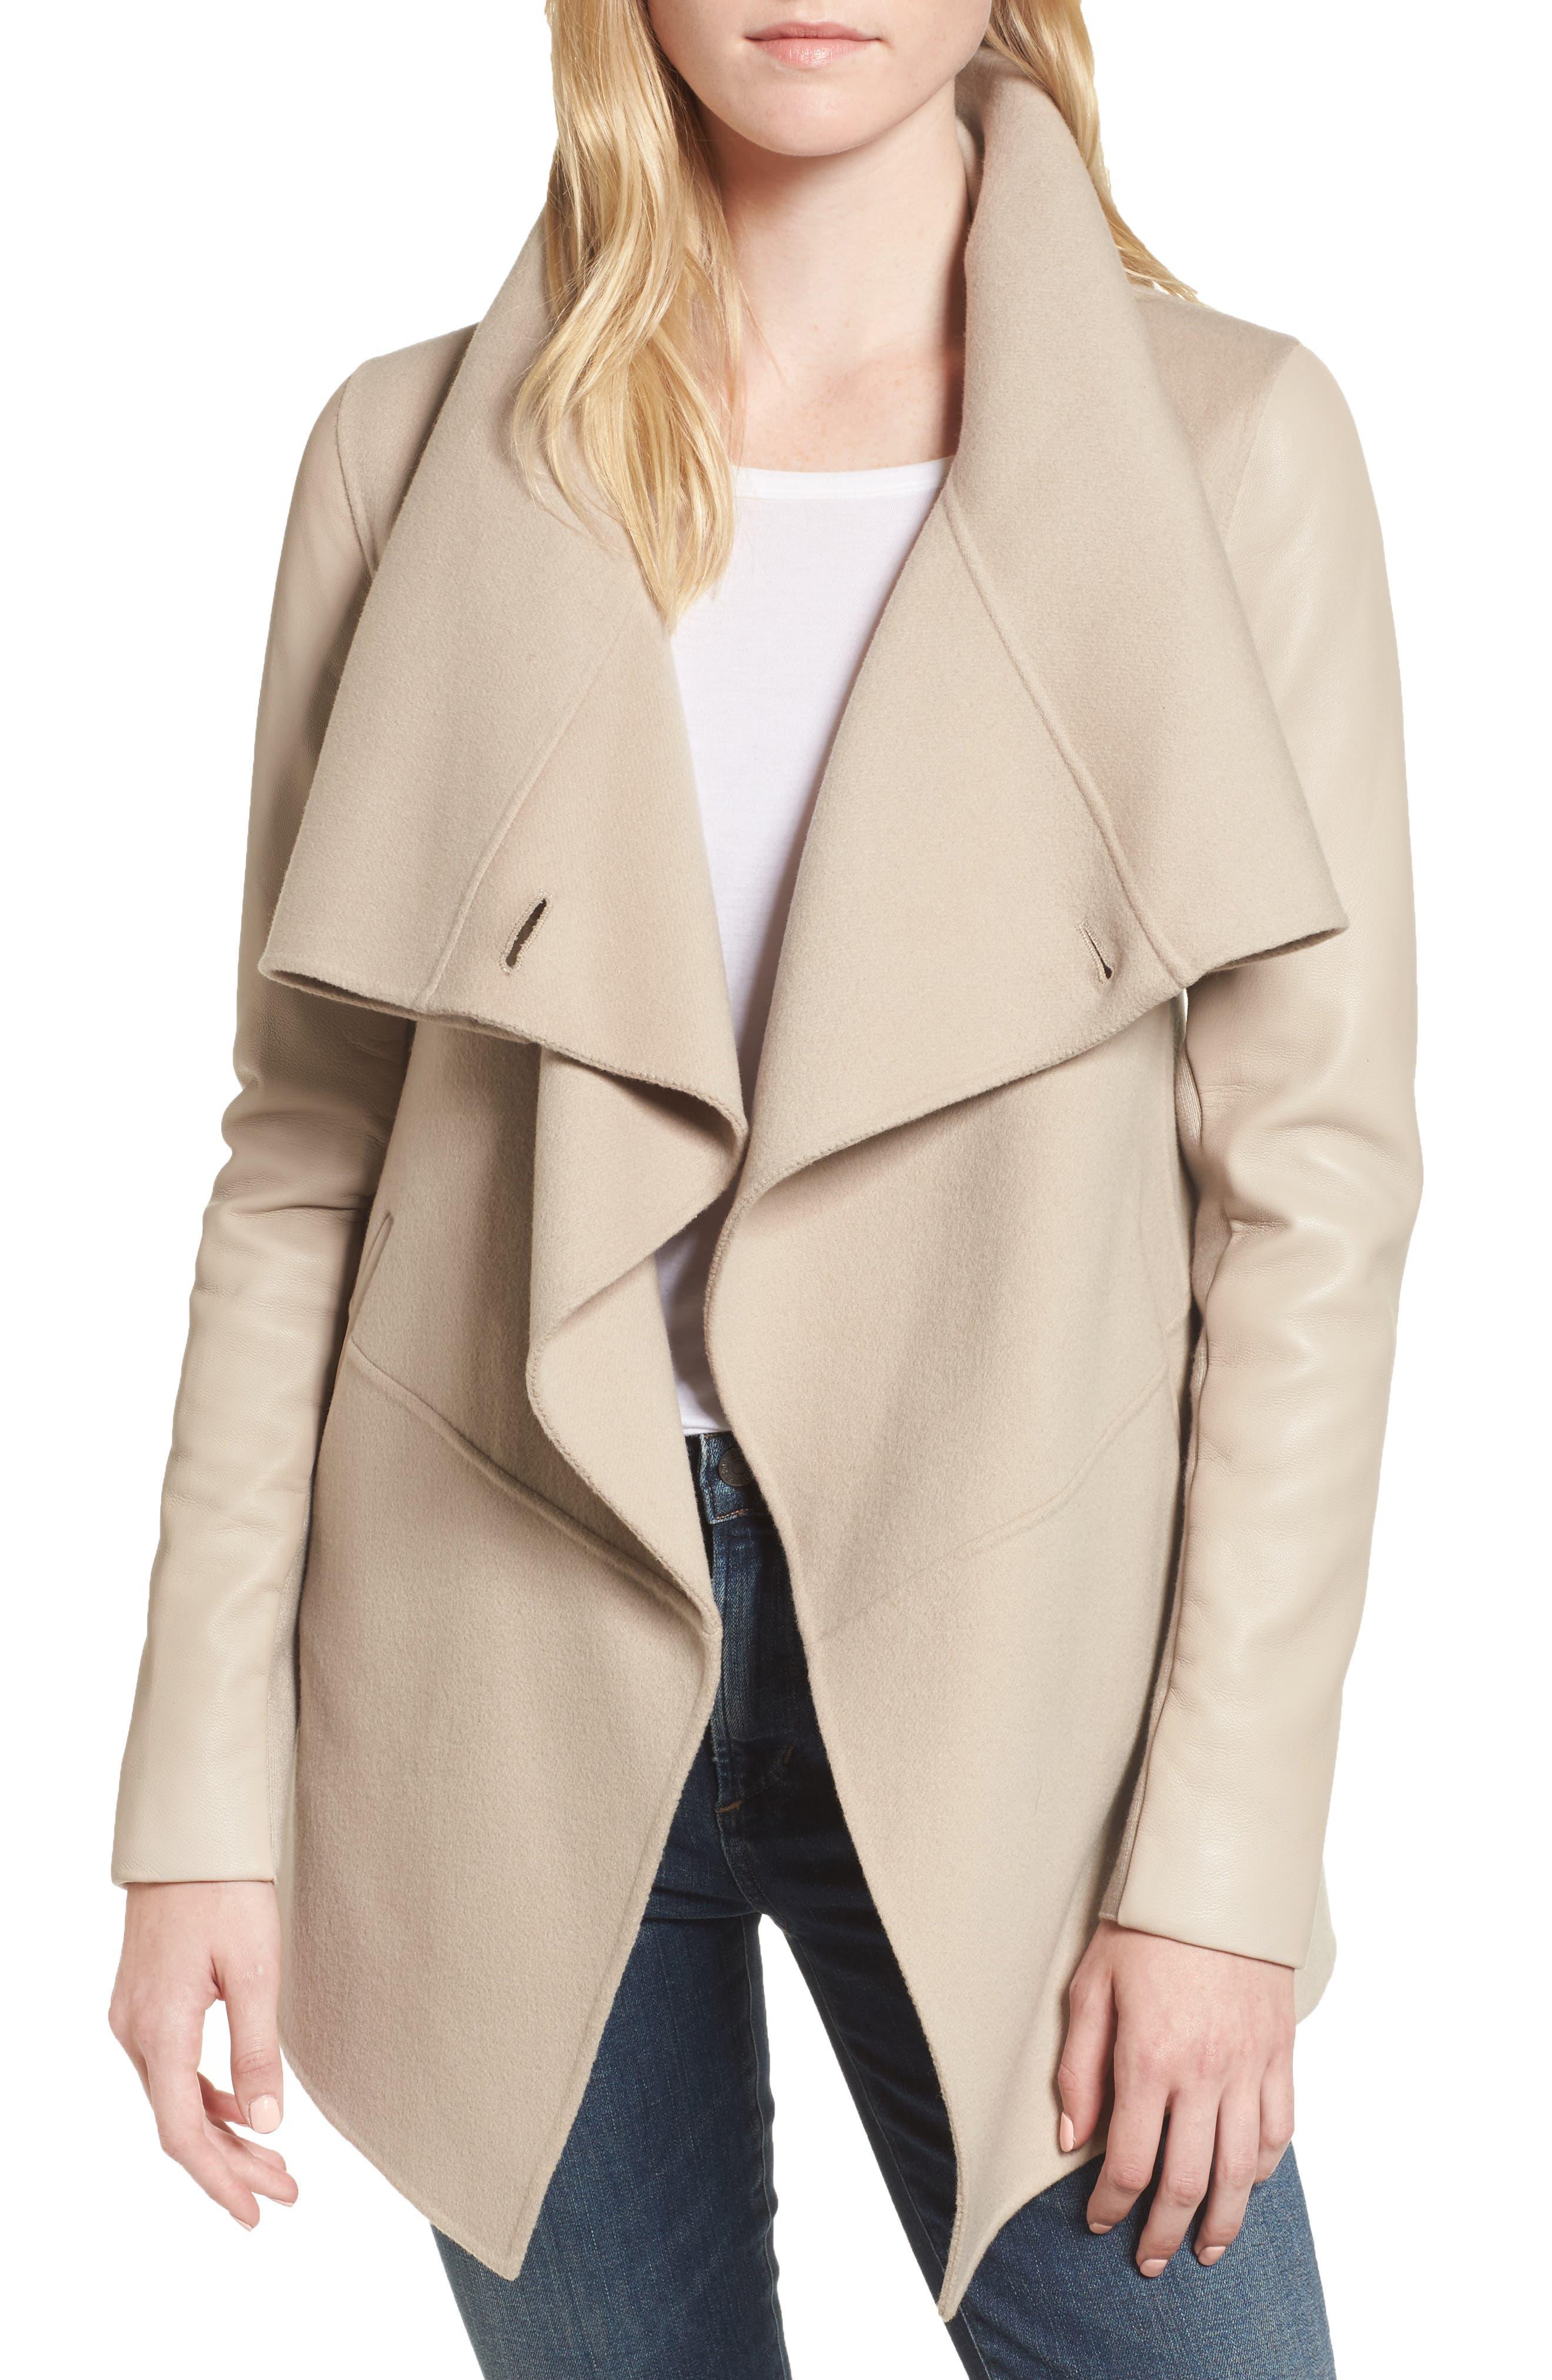 Vane Asymmetrical Leather Sleeve Coat,                             Main thumbnail 1, color,                             Sand